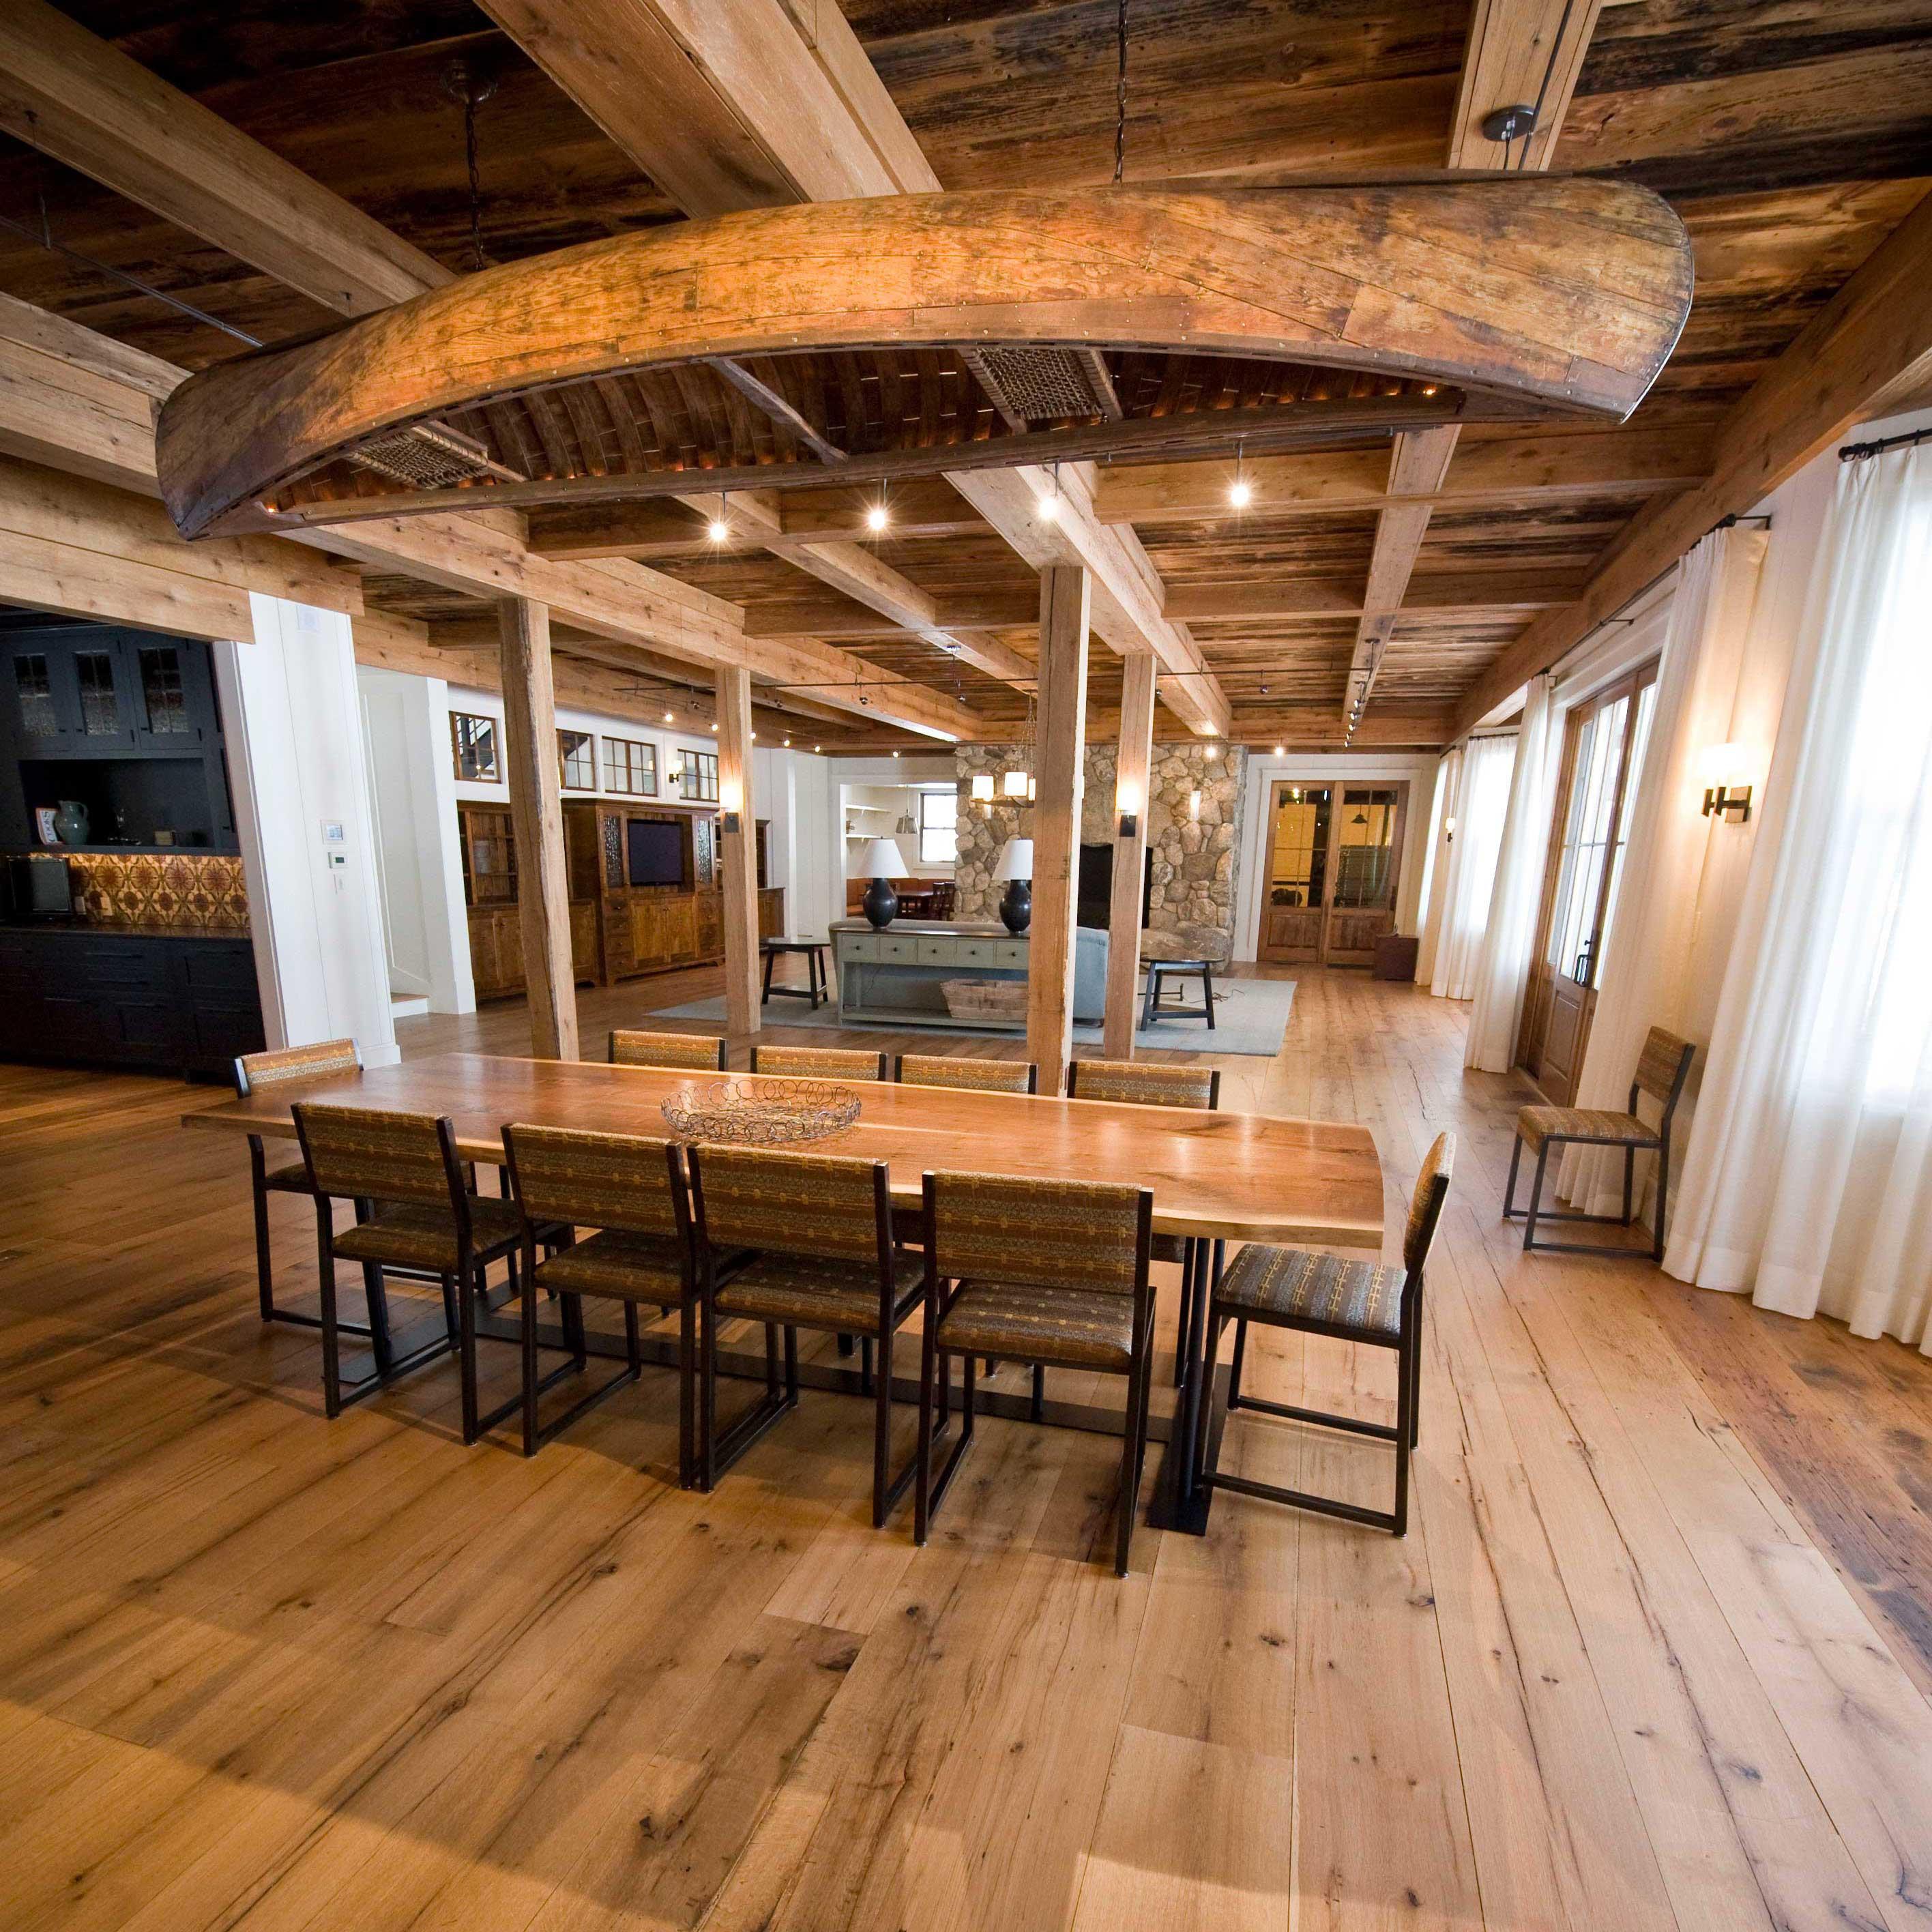 18 Elegant Used Hardwood Flooring for Sale 2021 free download used hardwood flooring for sale of longleaf lumber reclaimed red white oak wood regarding reclaimed white oak floors